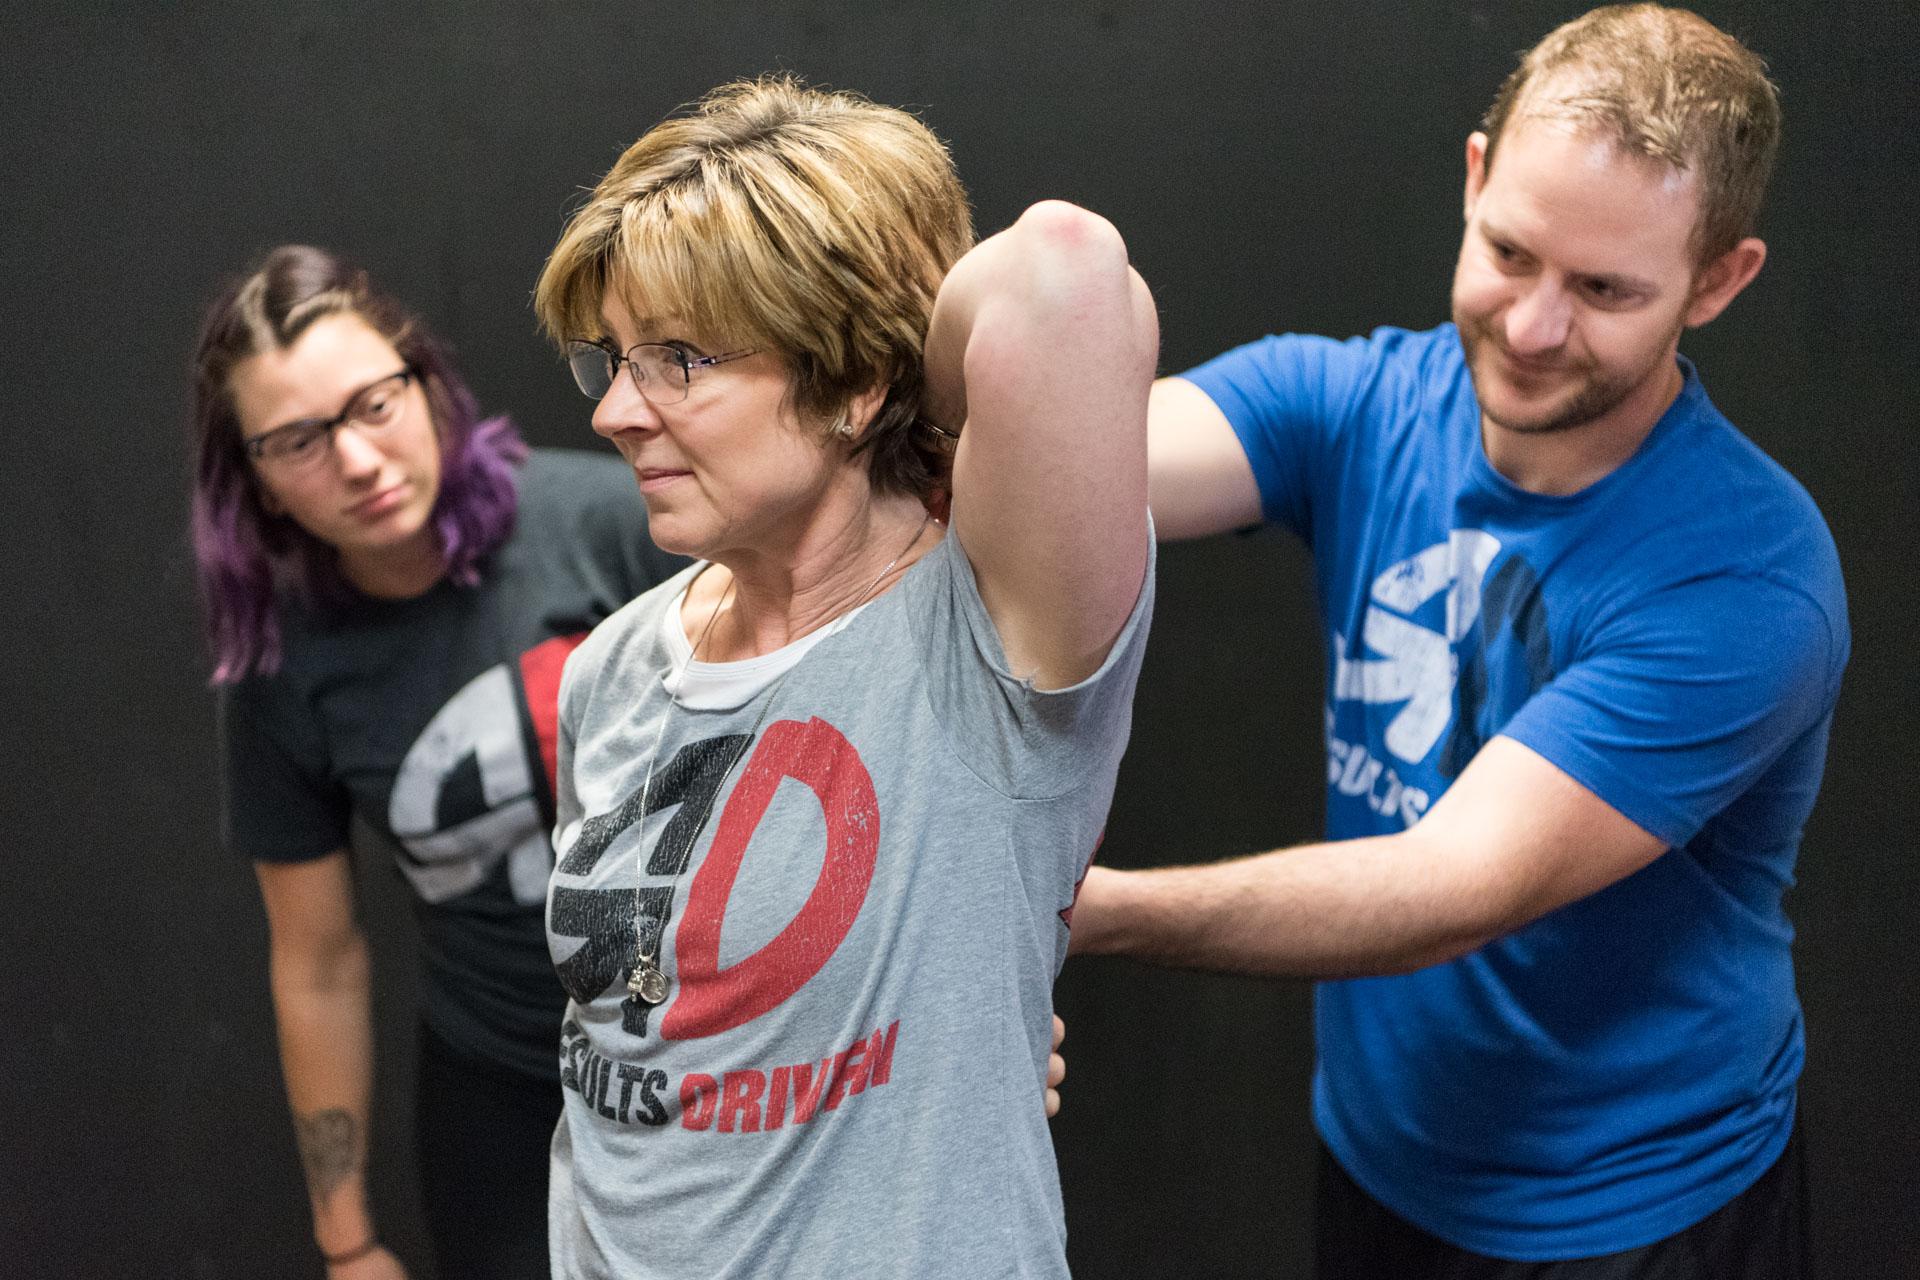 results-driven- workshop movement work capacity shoulder mobility.jpg